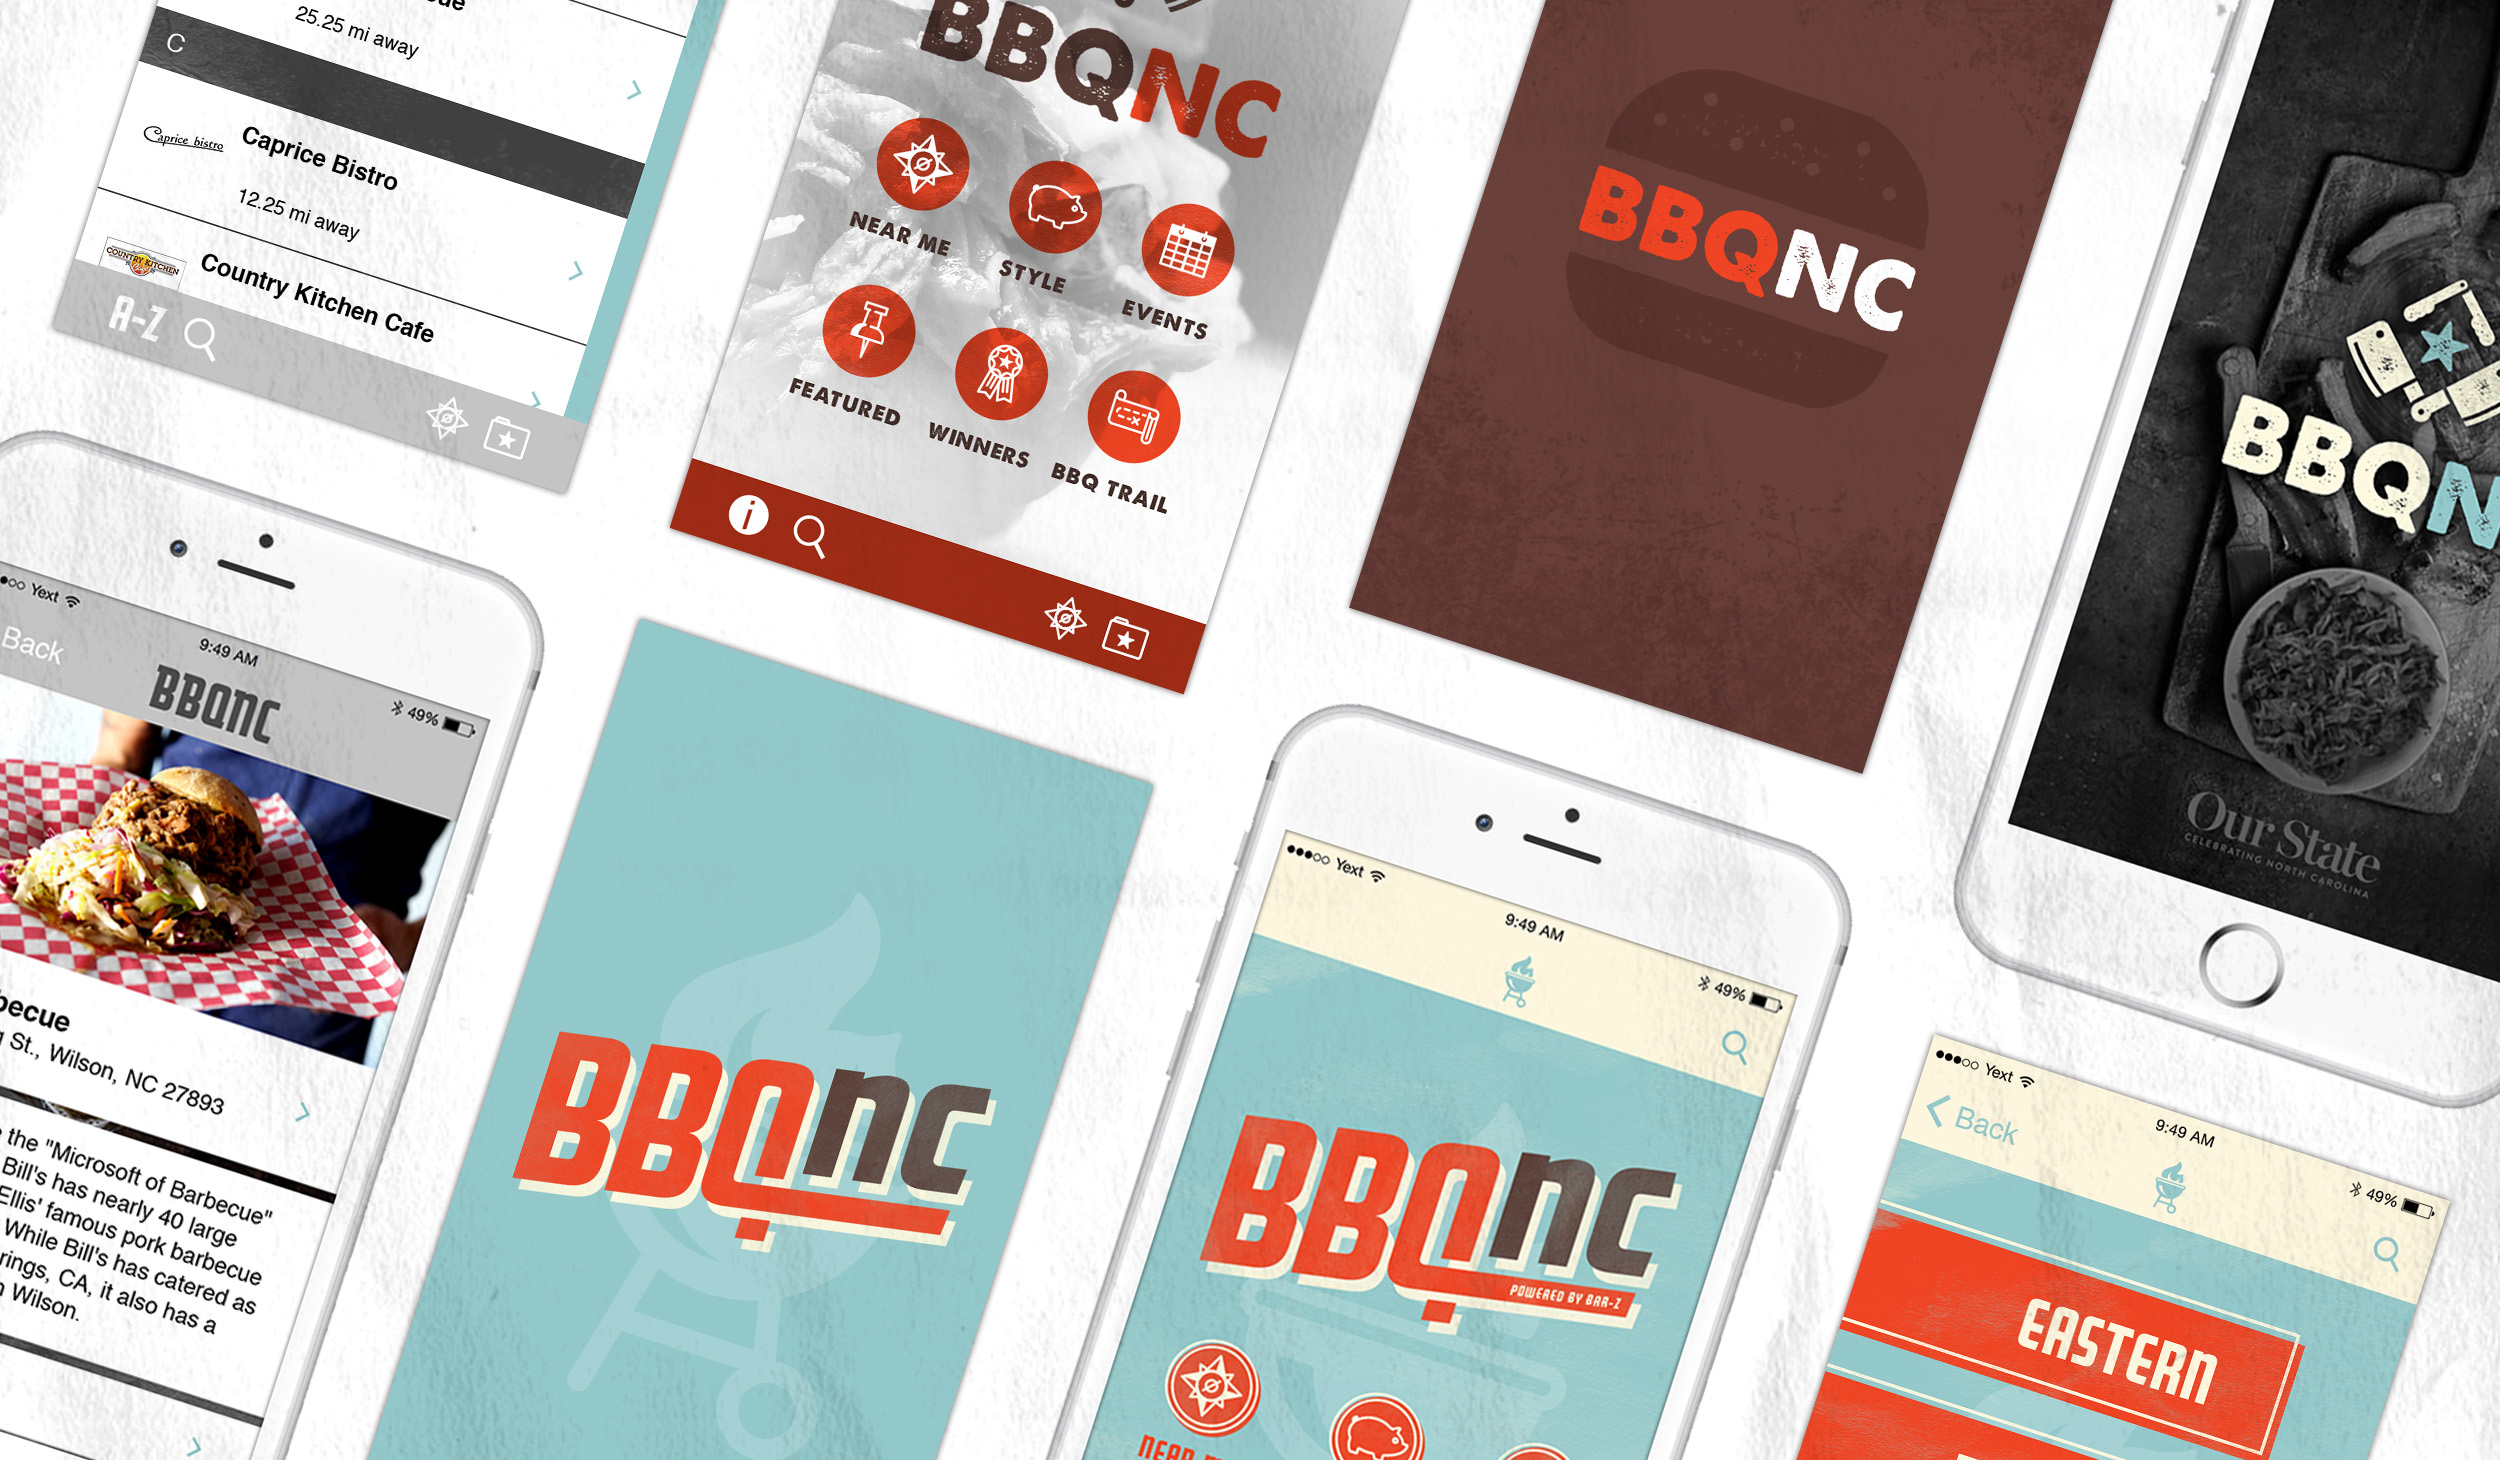 BBQNC-Process.jpg